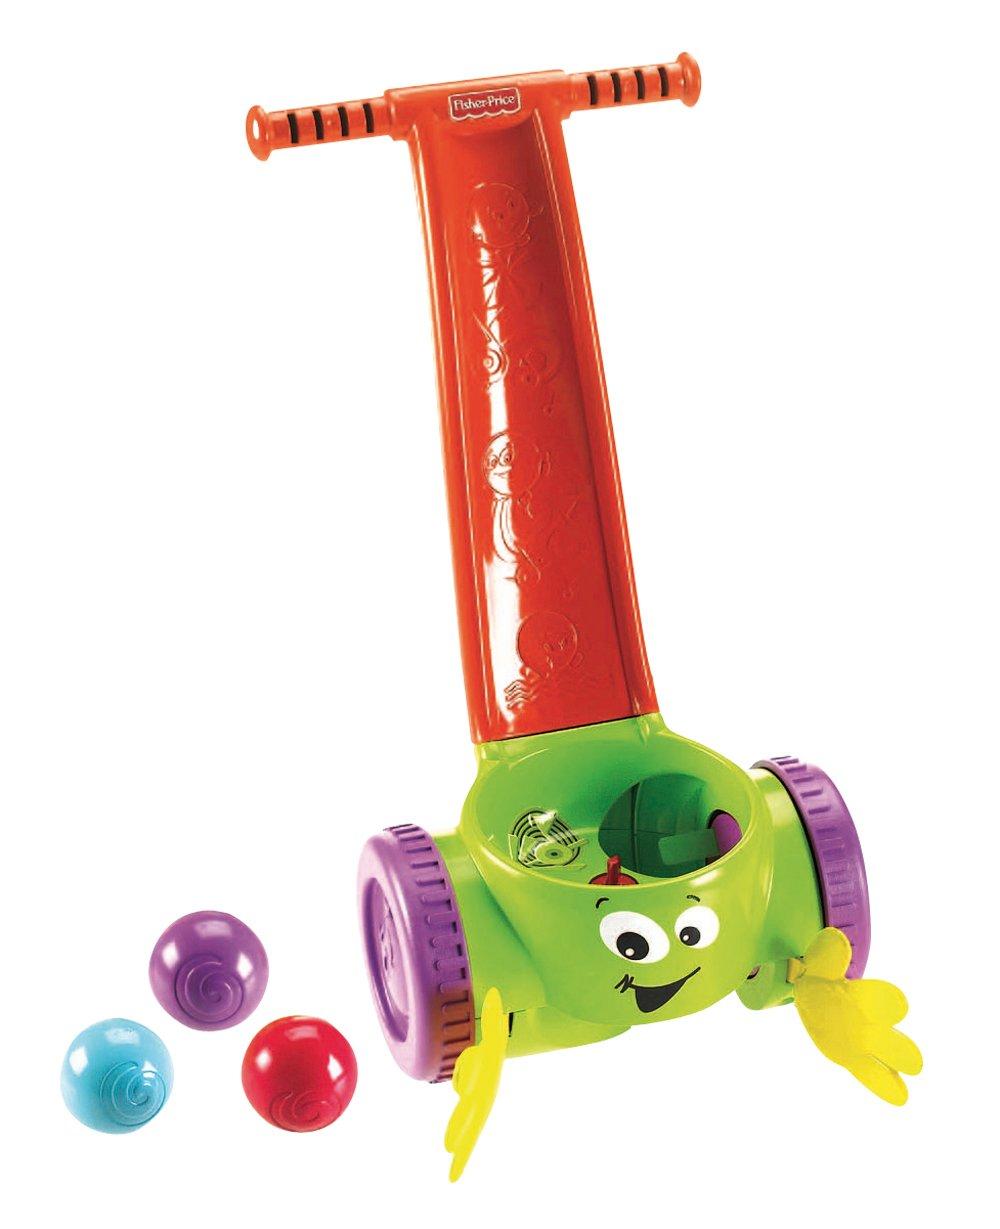 Fisher Price Atrapa Bolitas Saltarinas desarrollo de habilidades motoras Mattel W